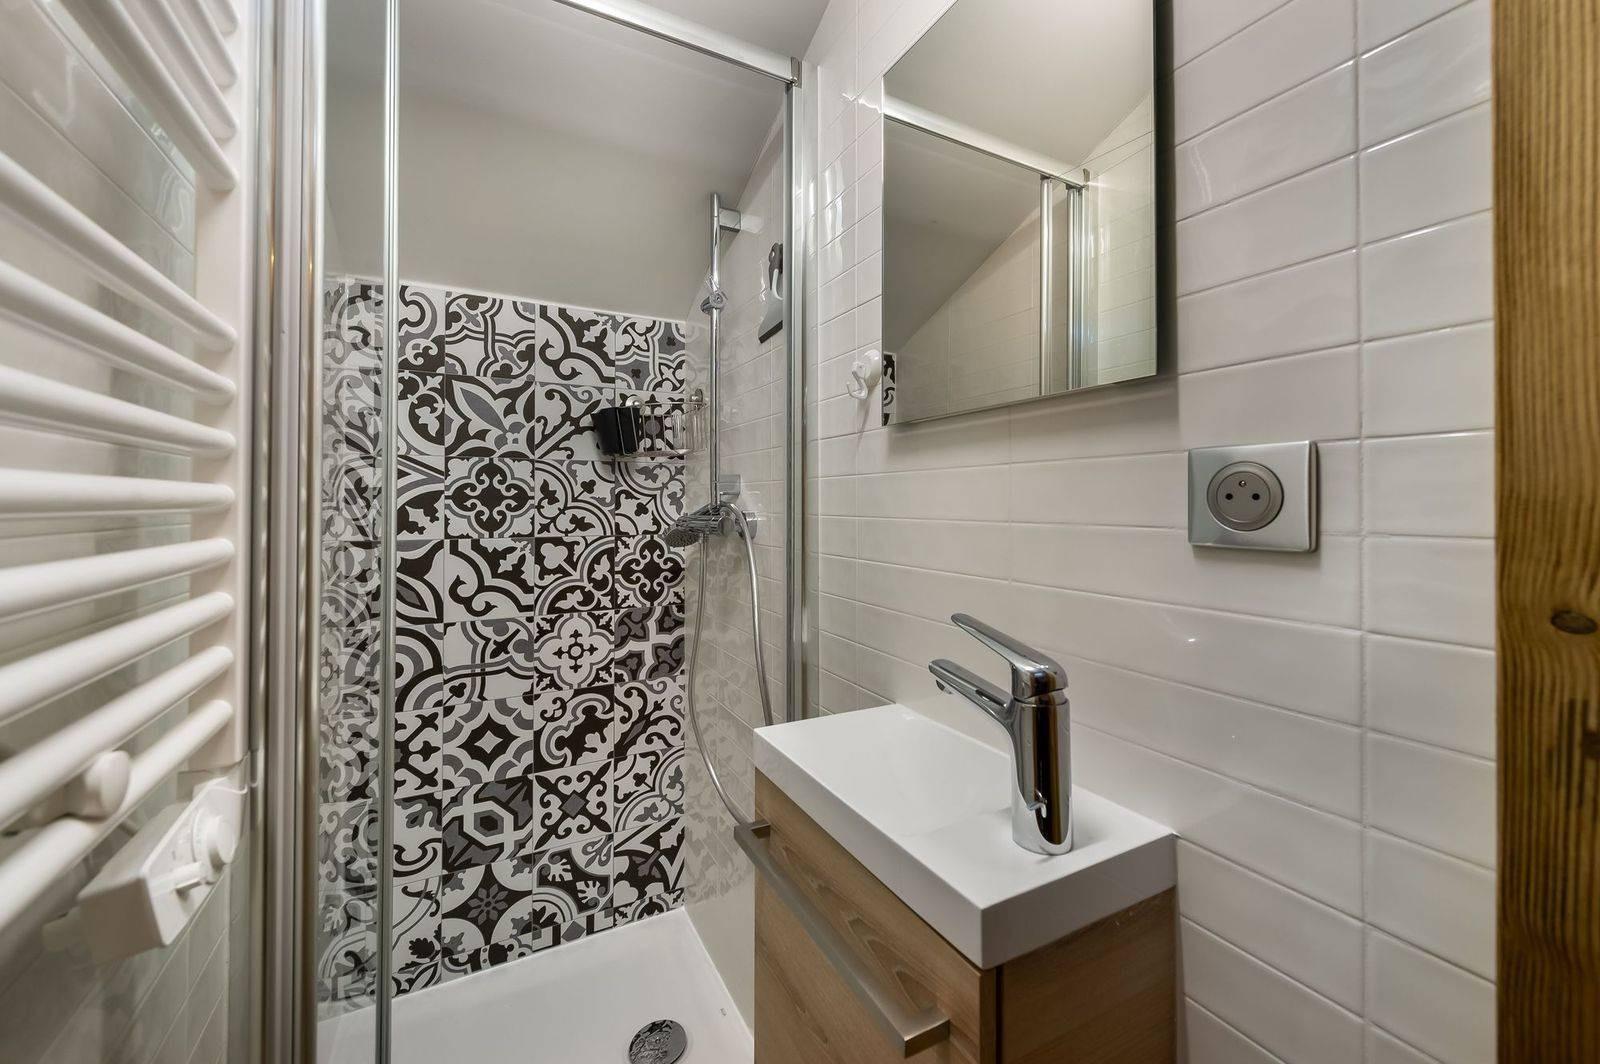 Val d'Isère Luxury Rental Appartment Virlouve Bathroom 2